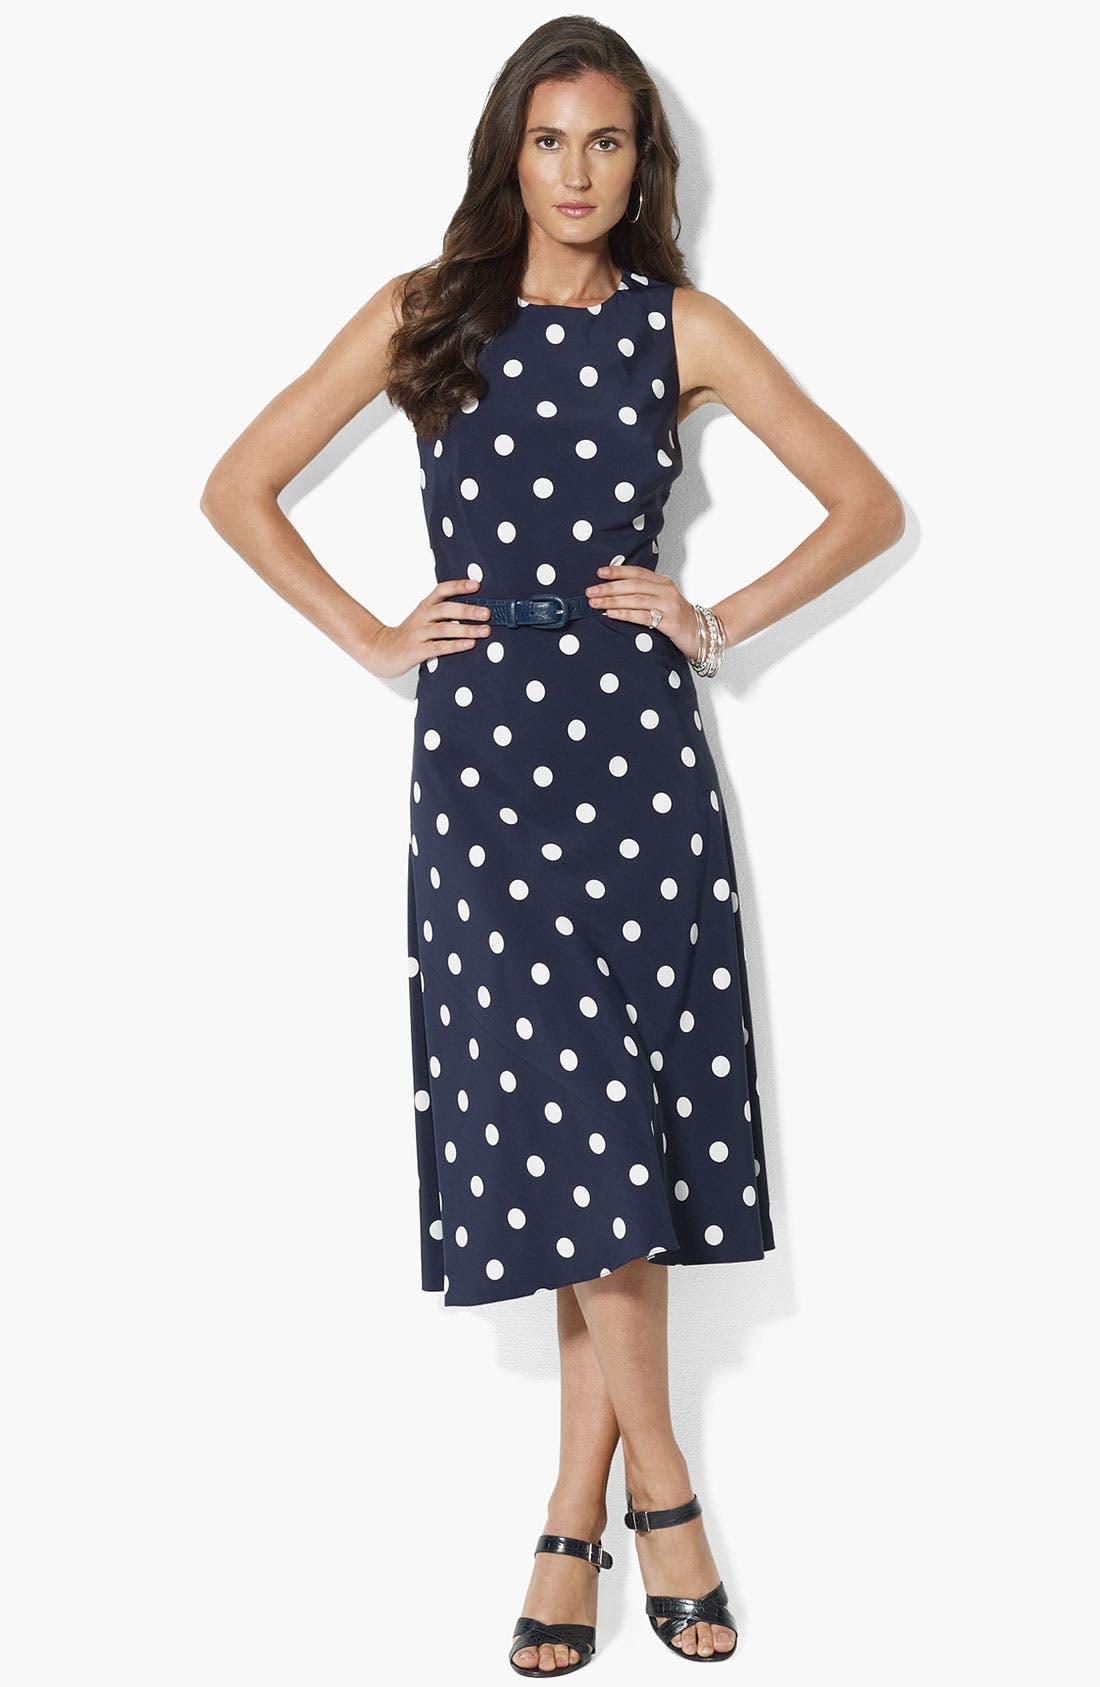 Main Image - Lauren Ralph Lauren Polka Dot Fit & Flare Dress